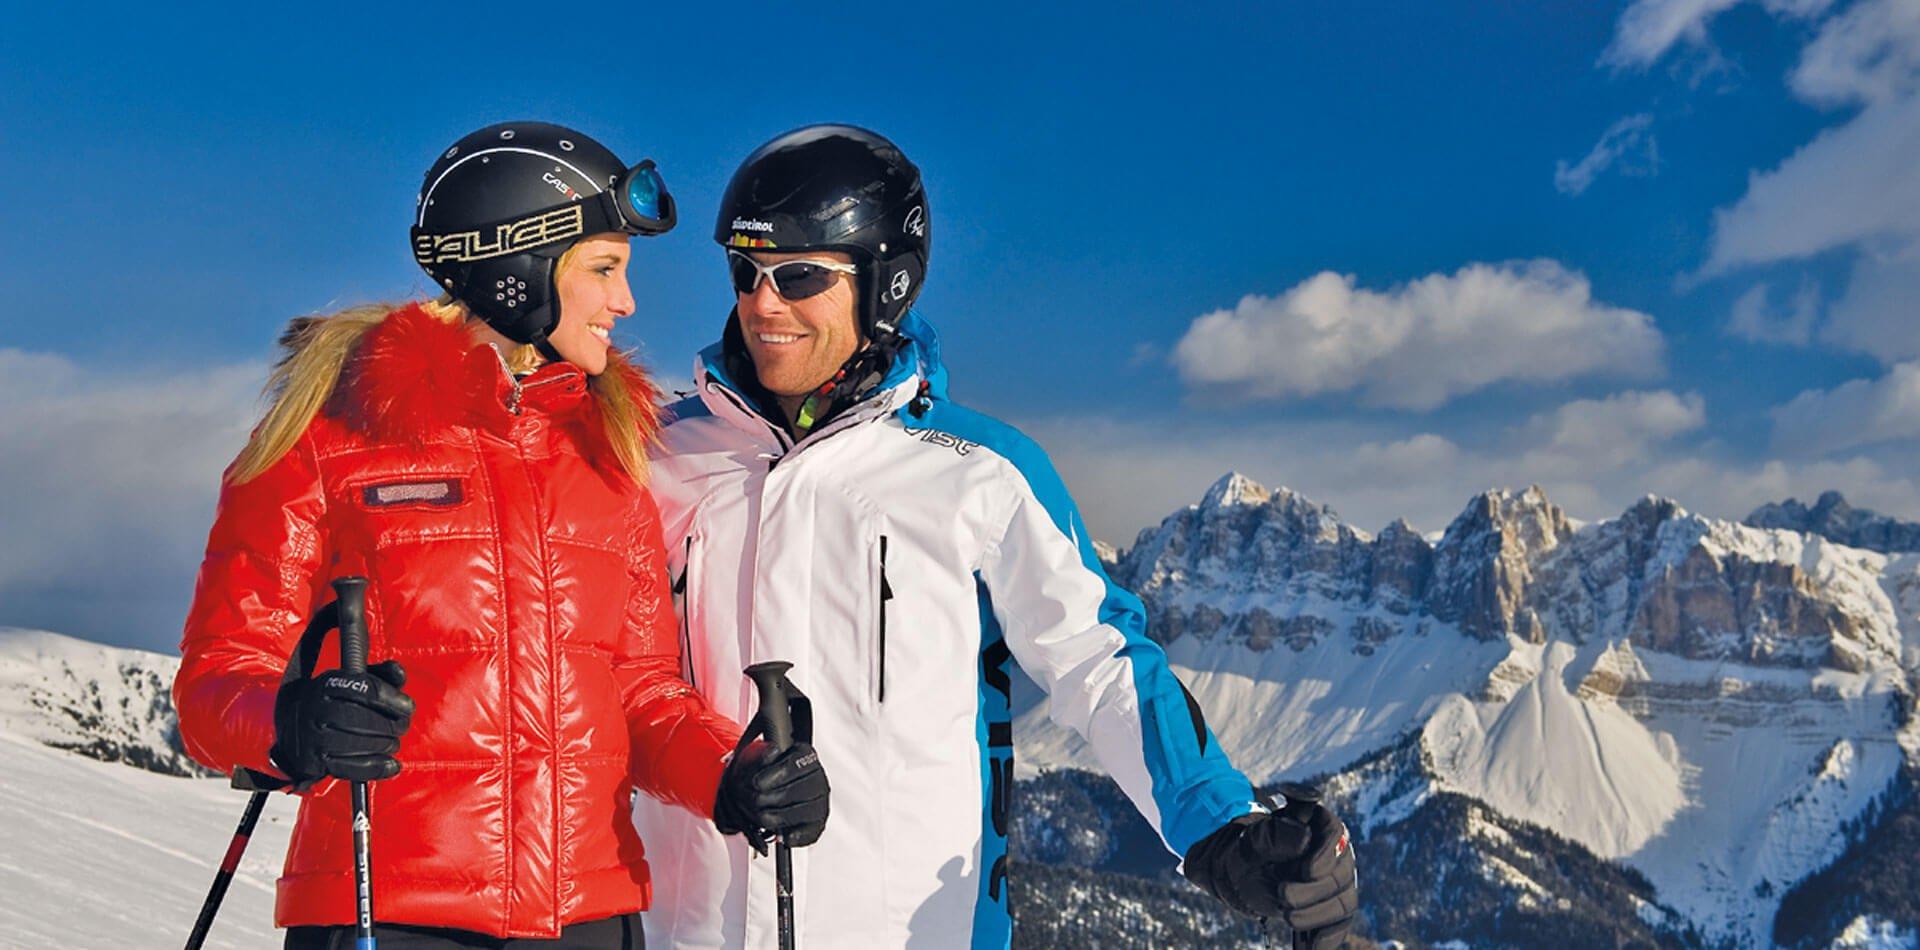 skiurlaub-skigebiet-plose